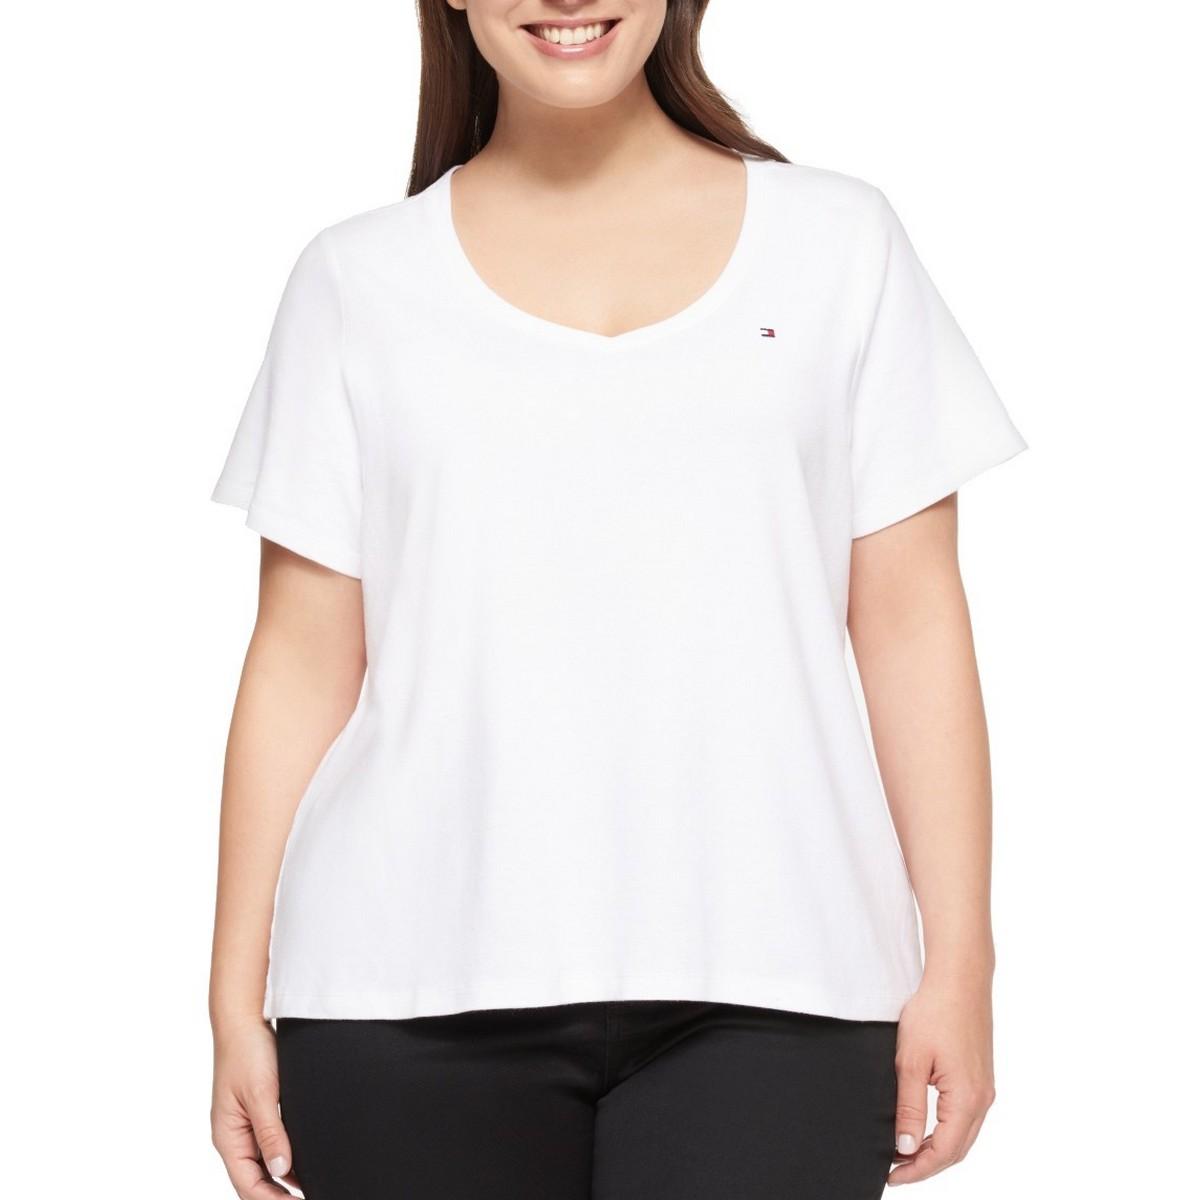 TOMMY-HILFIGER-NEW-Women-039-s-Plus-Size-Cotton-Logo-Print-Casual-Shirt-Top-TEDO